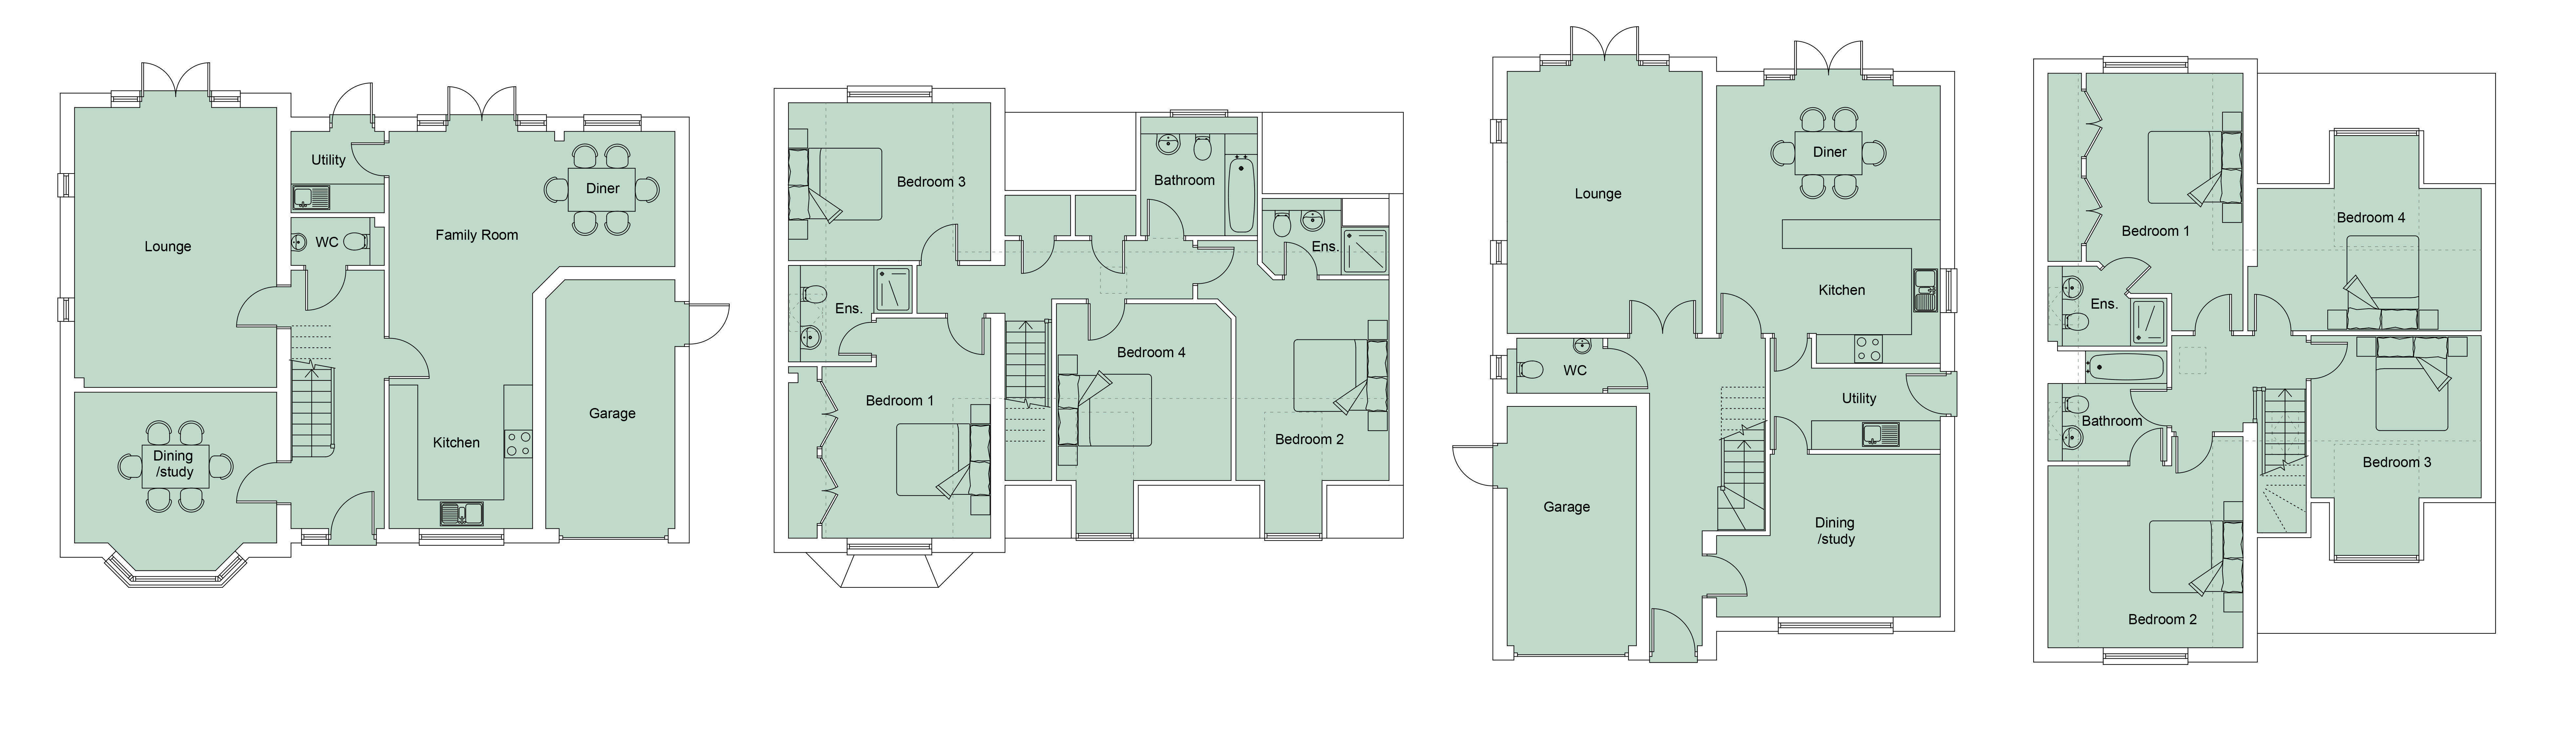 NEH001 Beech Grove Plots 2D floorplans 005